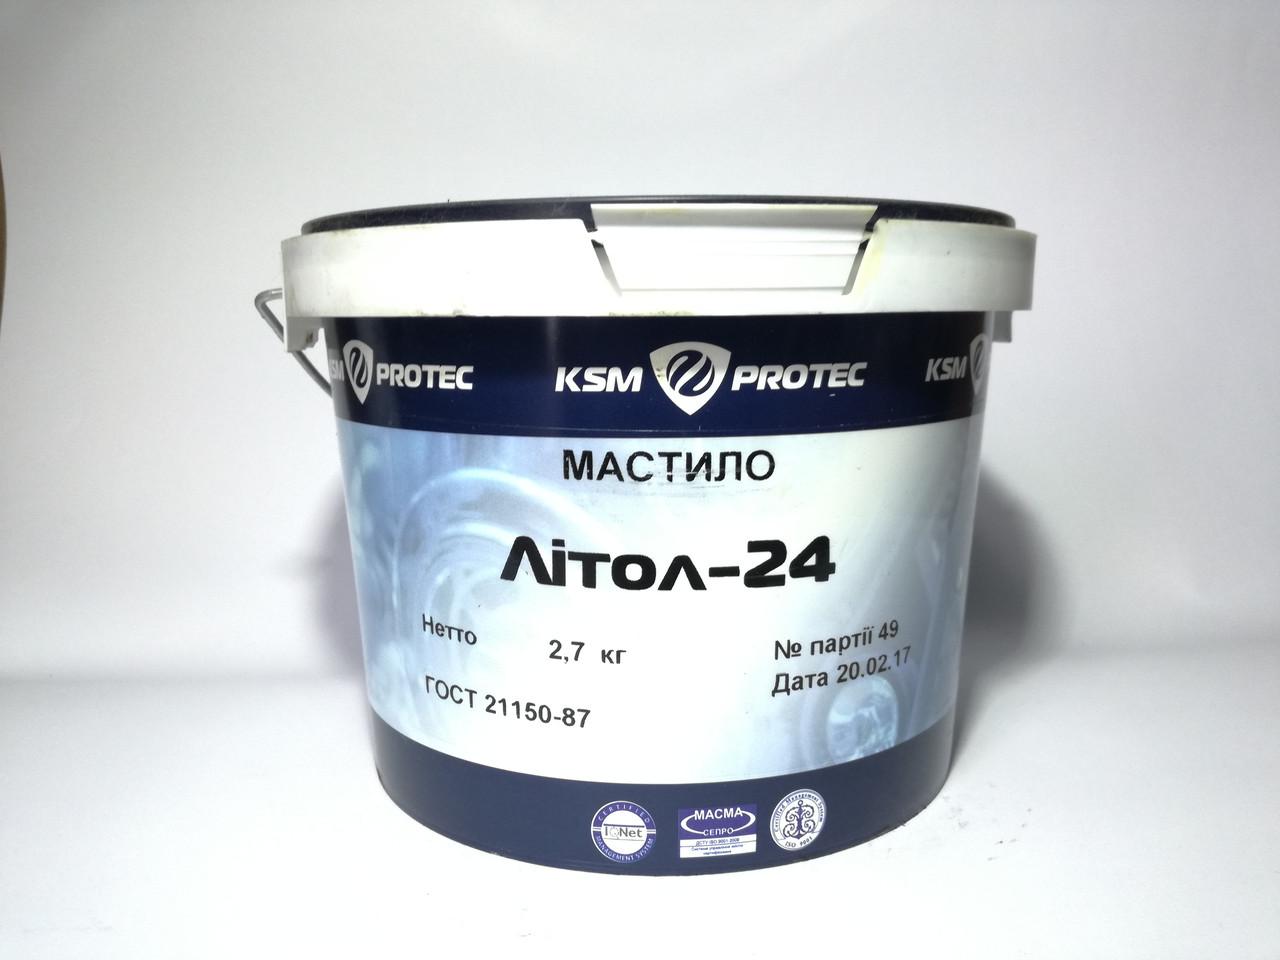 Смазка KSM Protec Литол-24 2,7кг